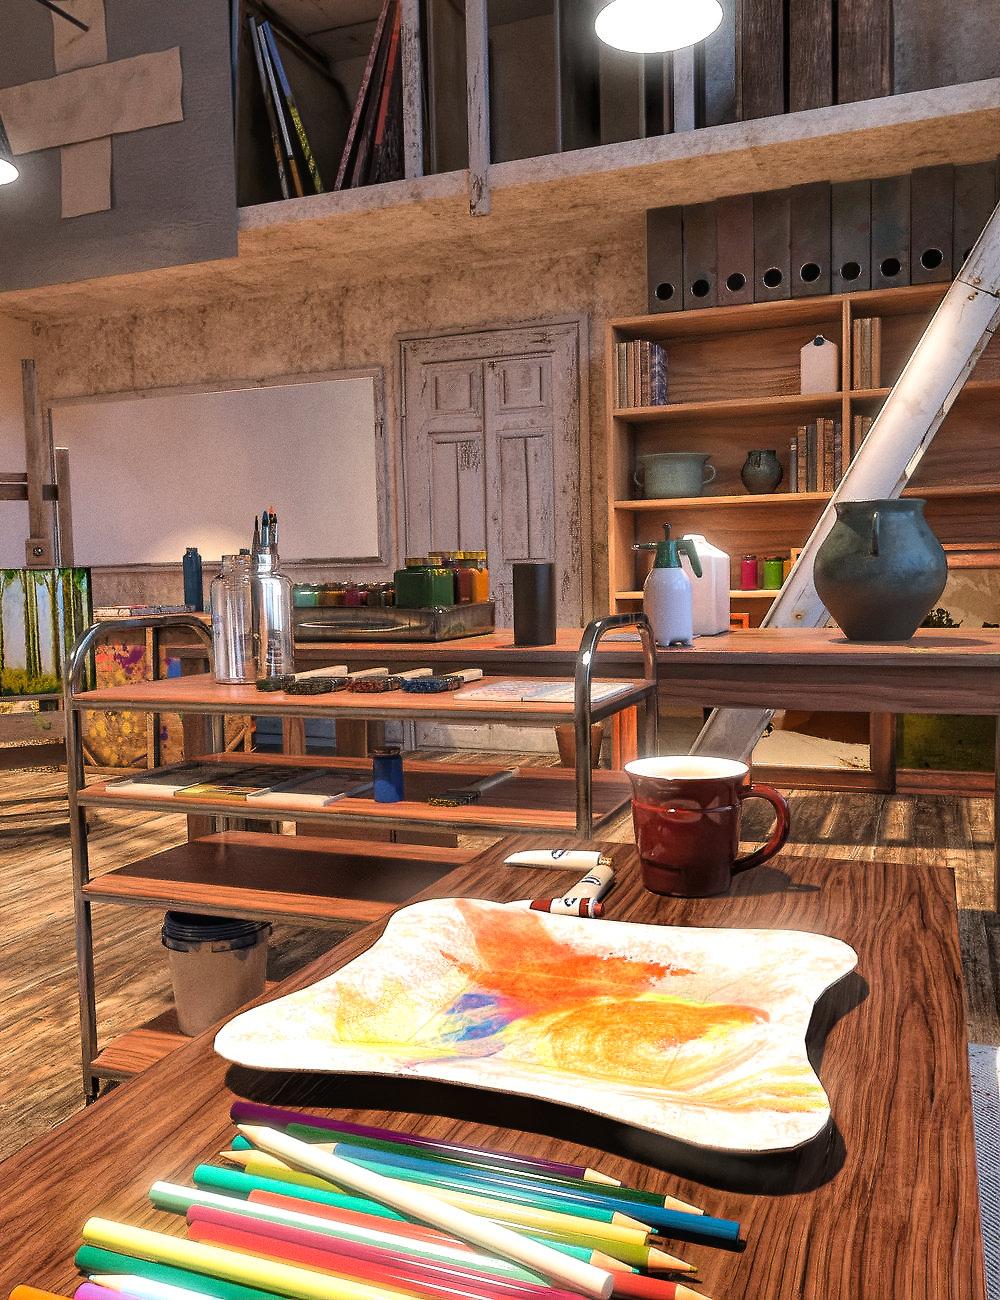 FG Painting Studio by: Fugazi1968Ironman, 3D Models by Daz 3D